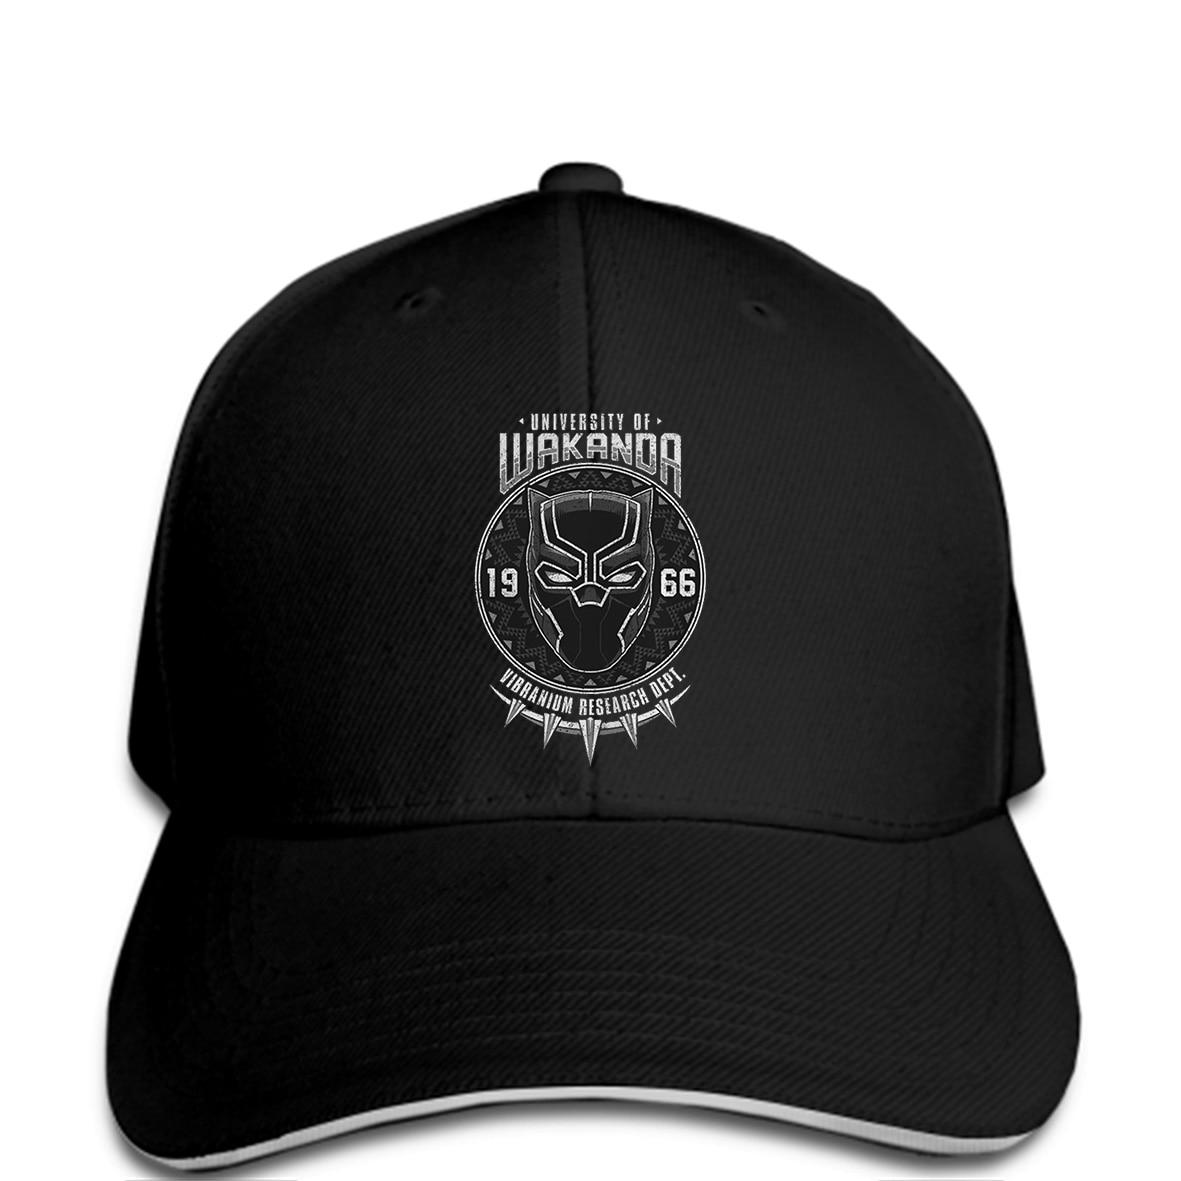 Baseball cap 2018 Fashion men Hat University of Wakanda Hat-in Baseball Caps  from Apparel Accessories on Aliexpress.com  8bac045ae25